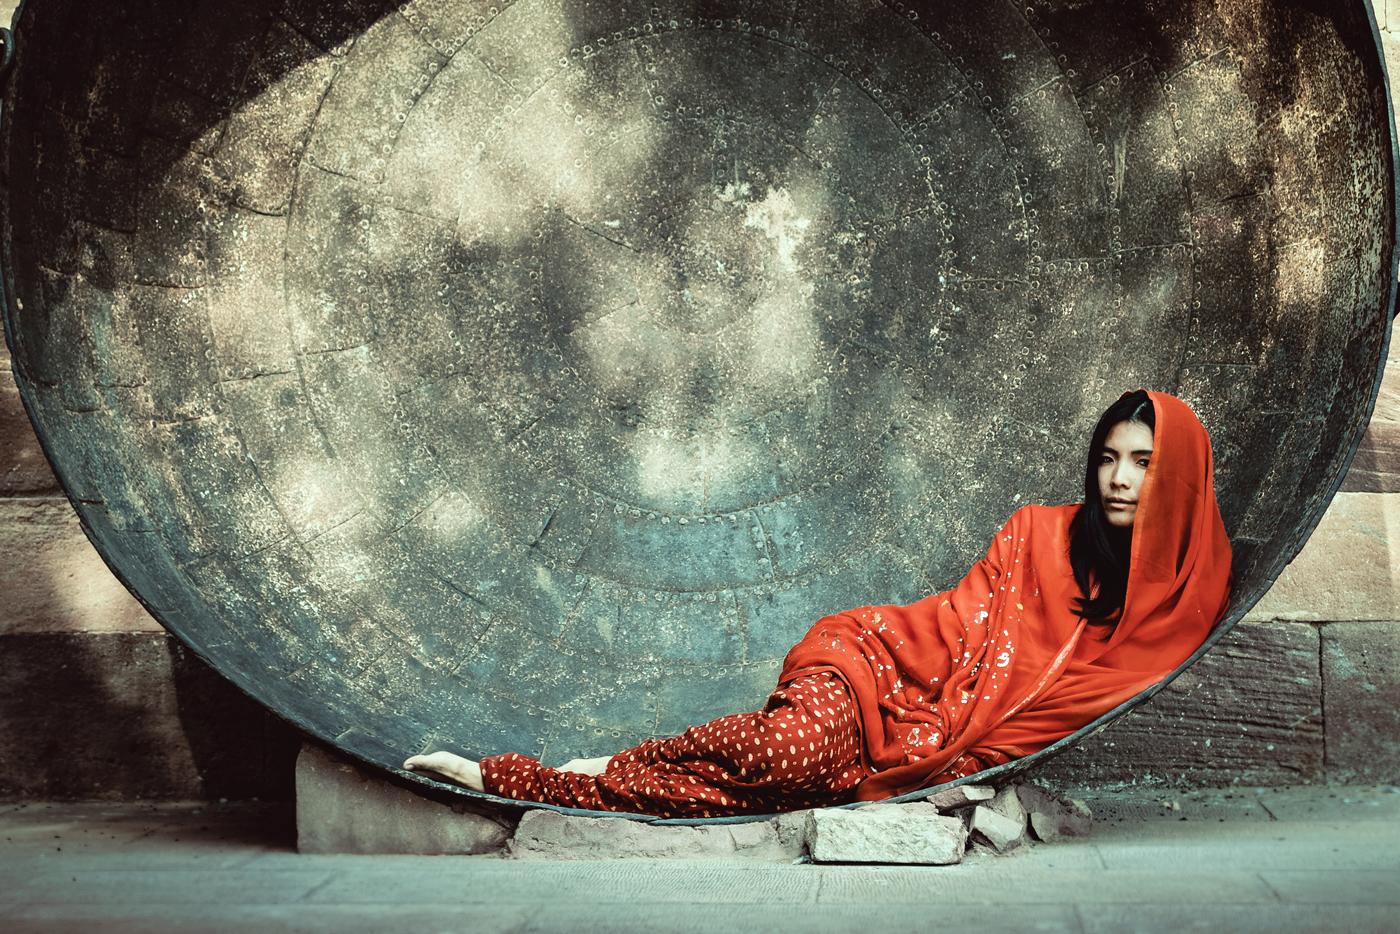 Месечина от Георги Александров - cTpaHHo